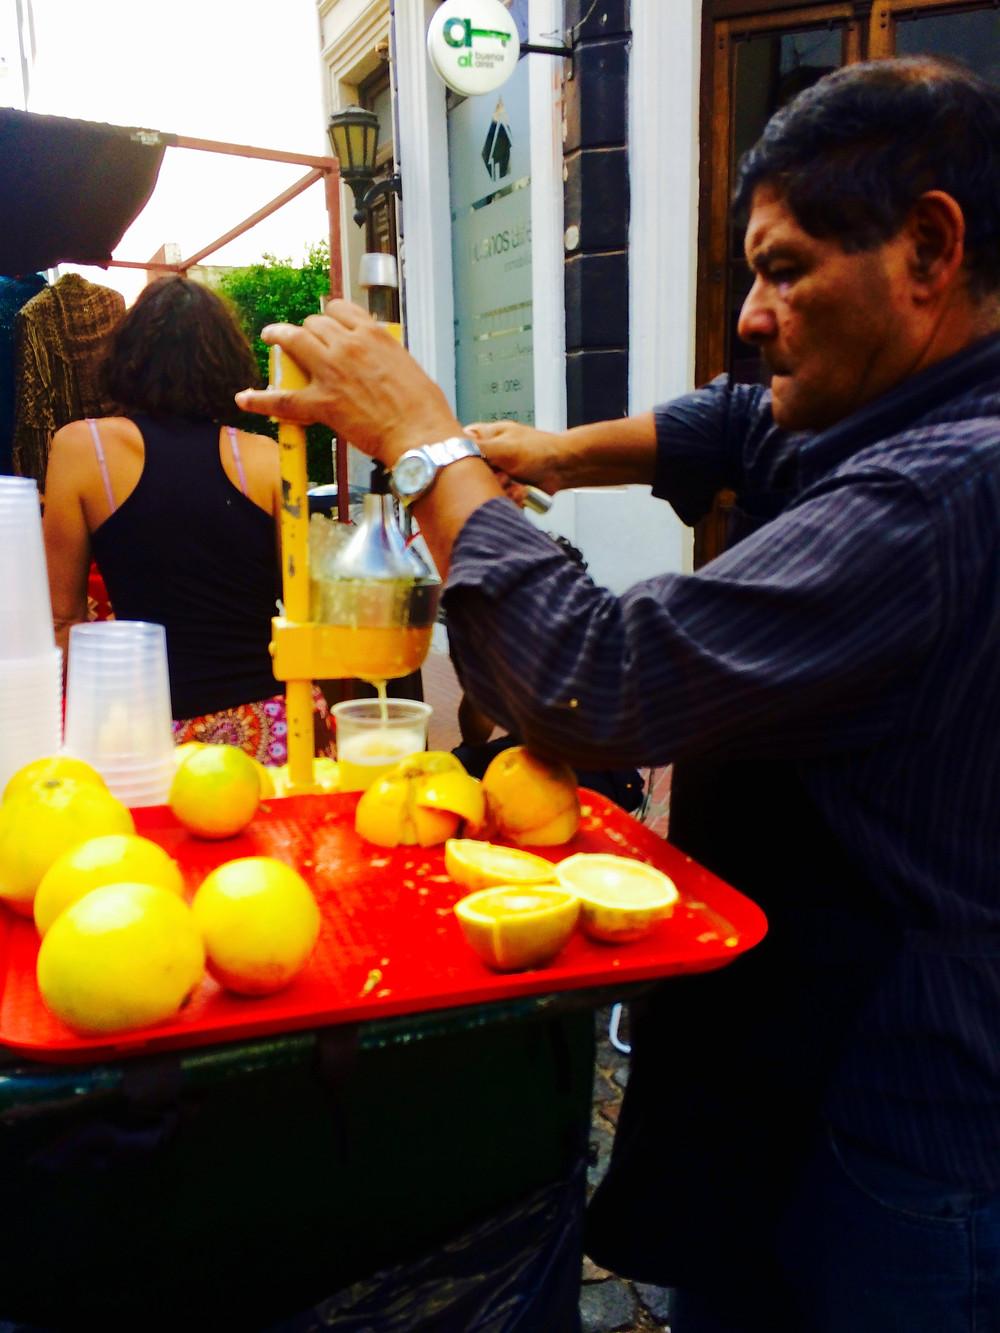 Fresh squeezed orange juice in San Telmo